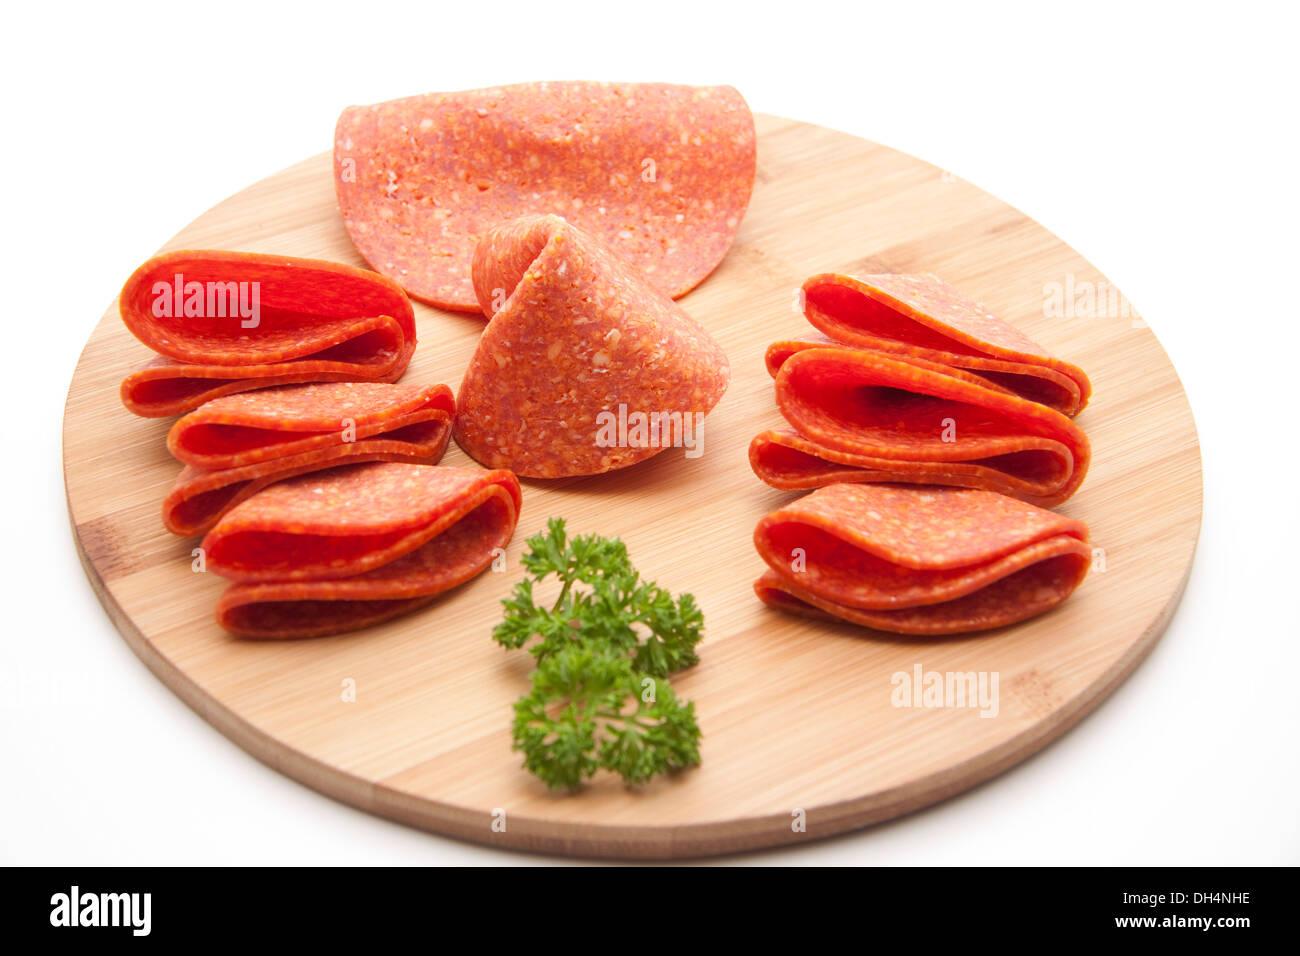 Fresh turkeys salami - Stock Image